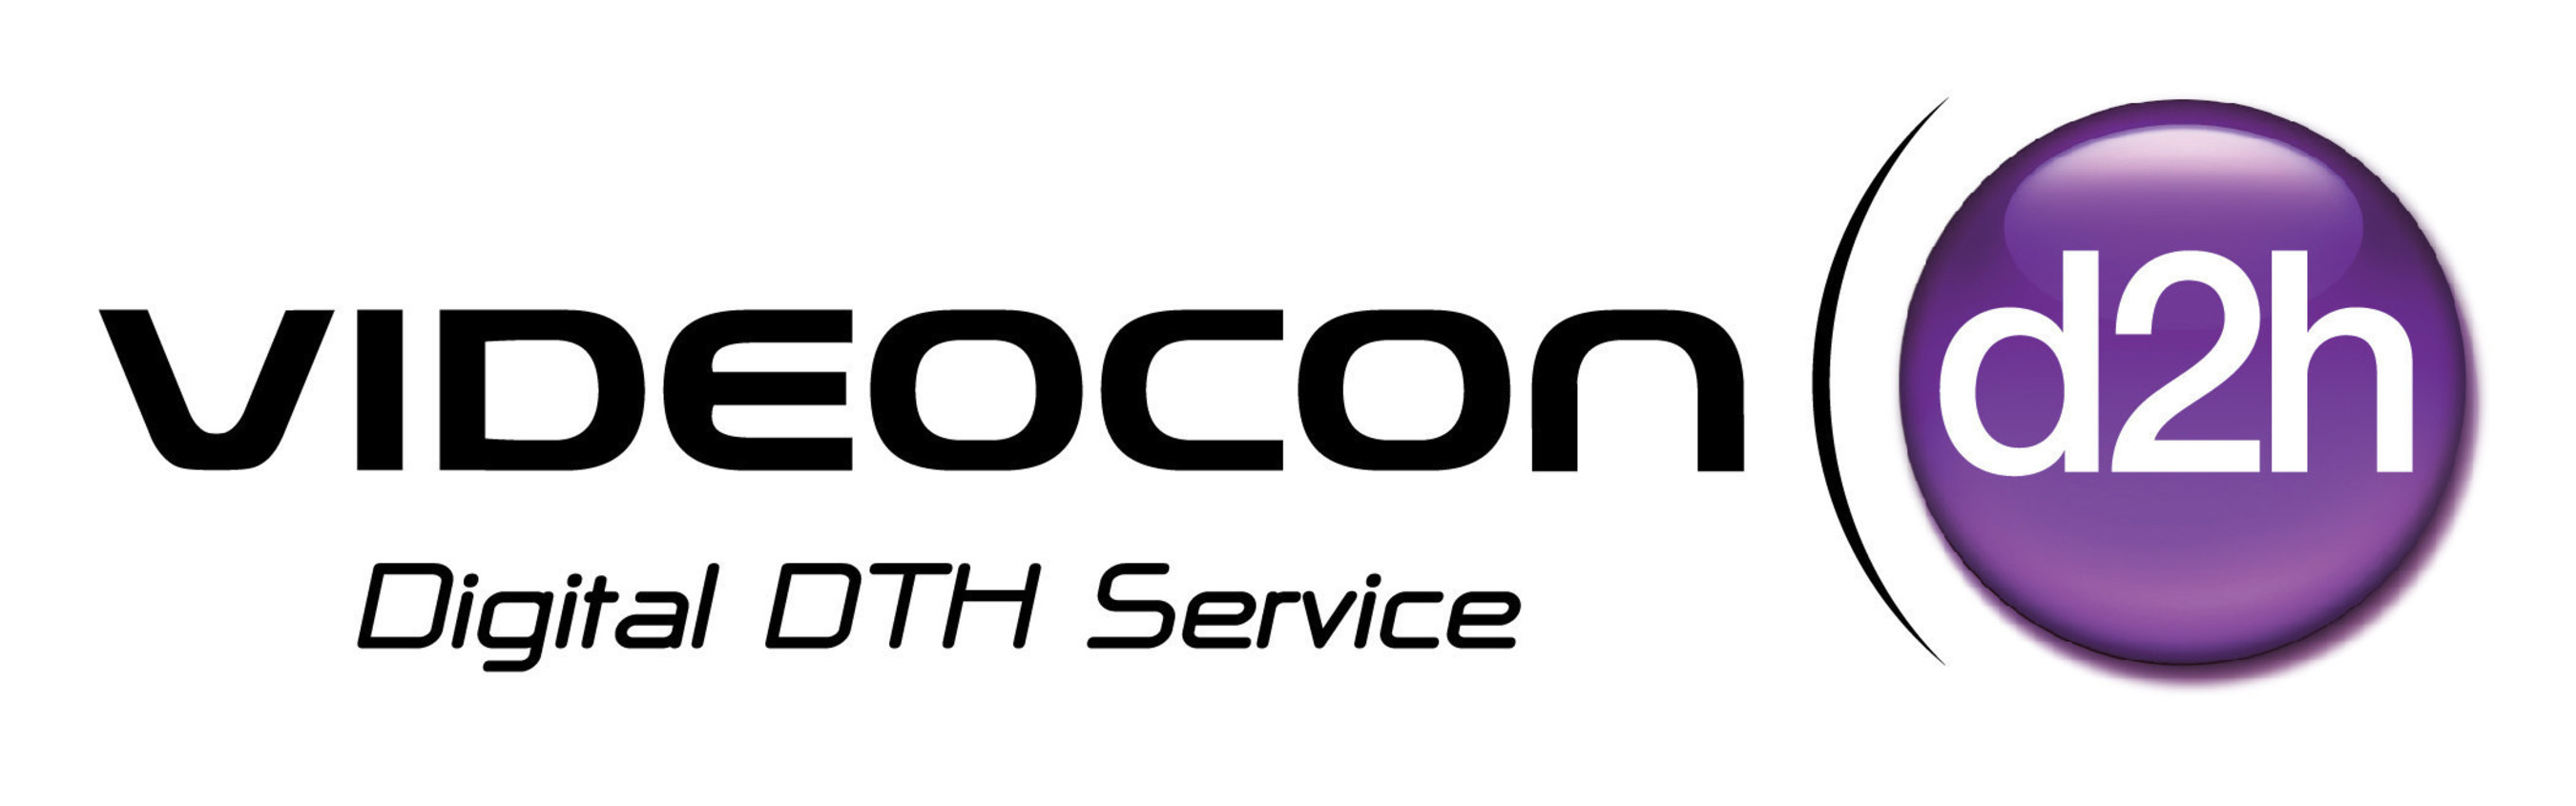 ideocon d2h Logo